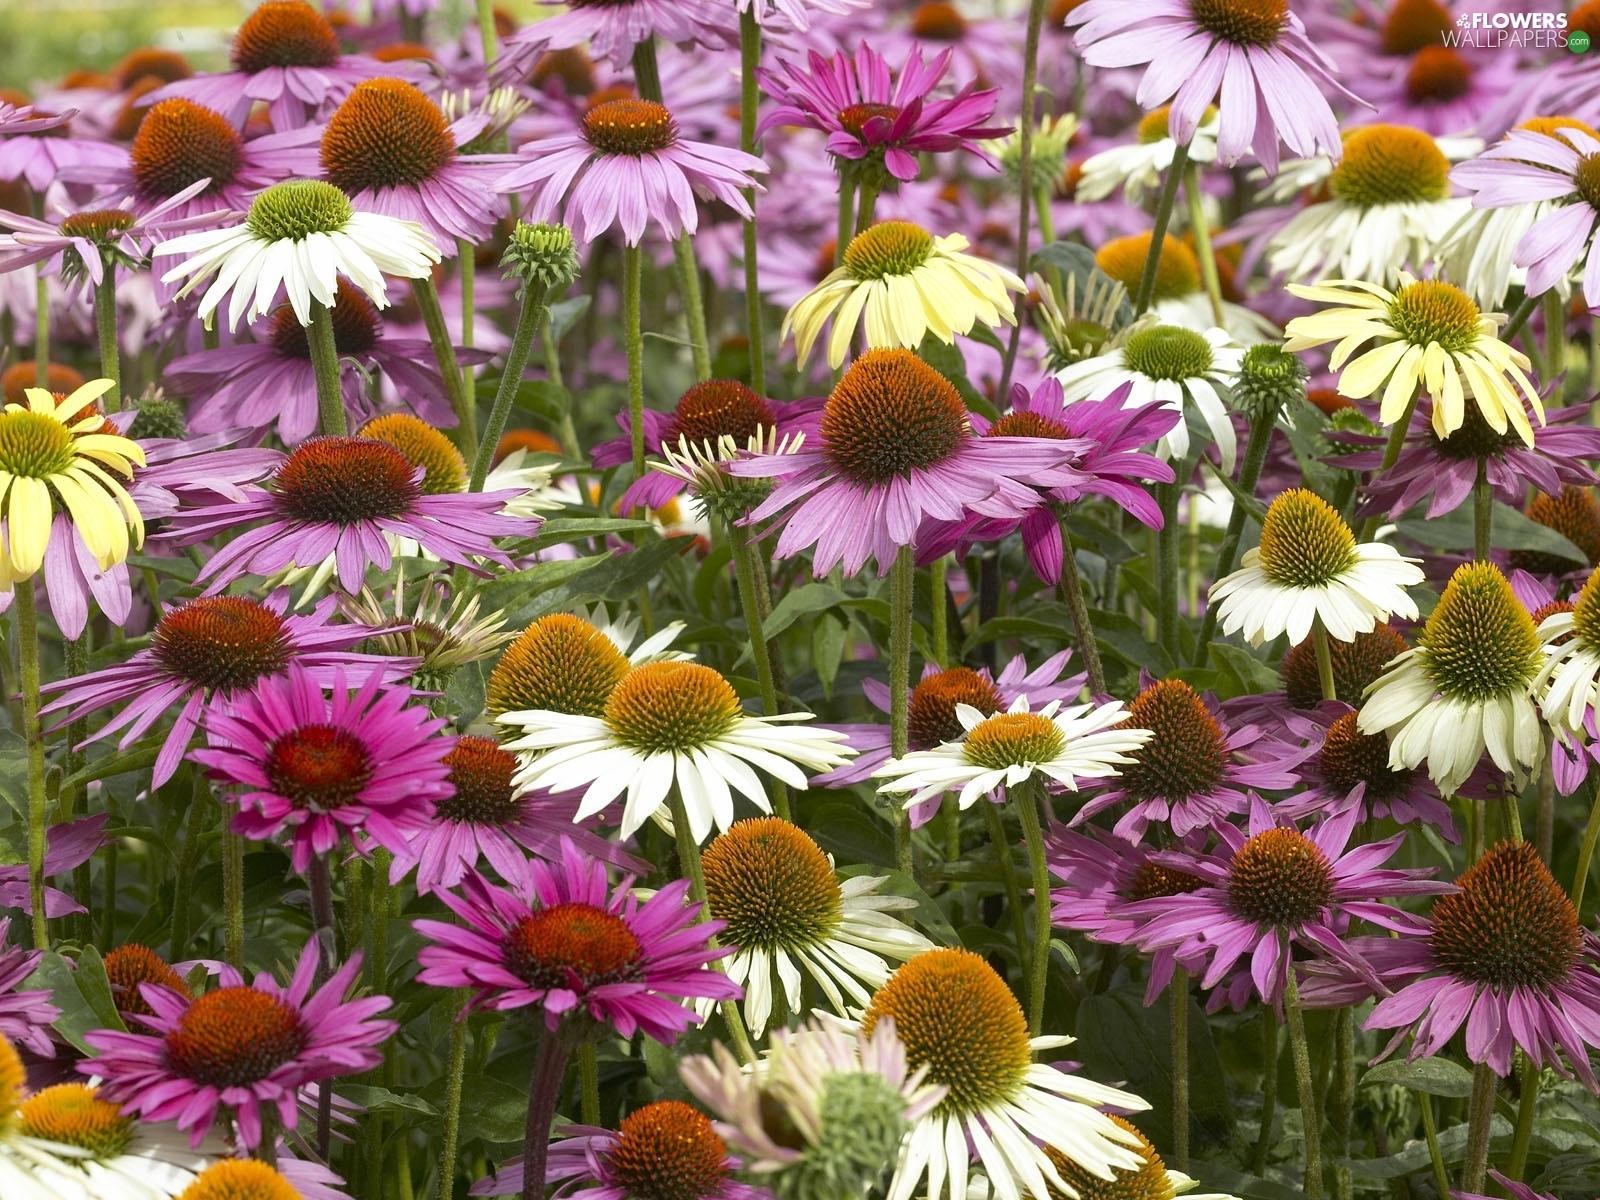 Purple Coneflower Wallpapers: Flowers Wallpapers: 1600x1200